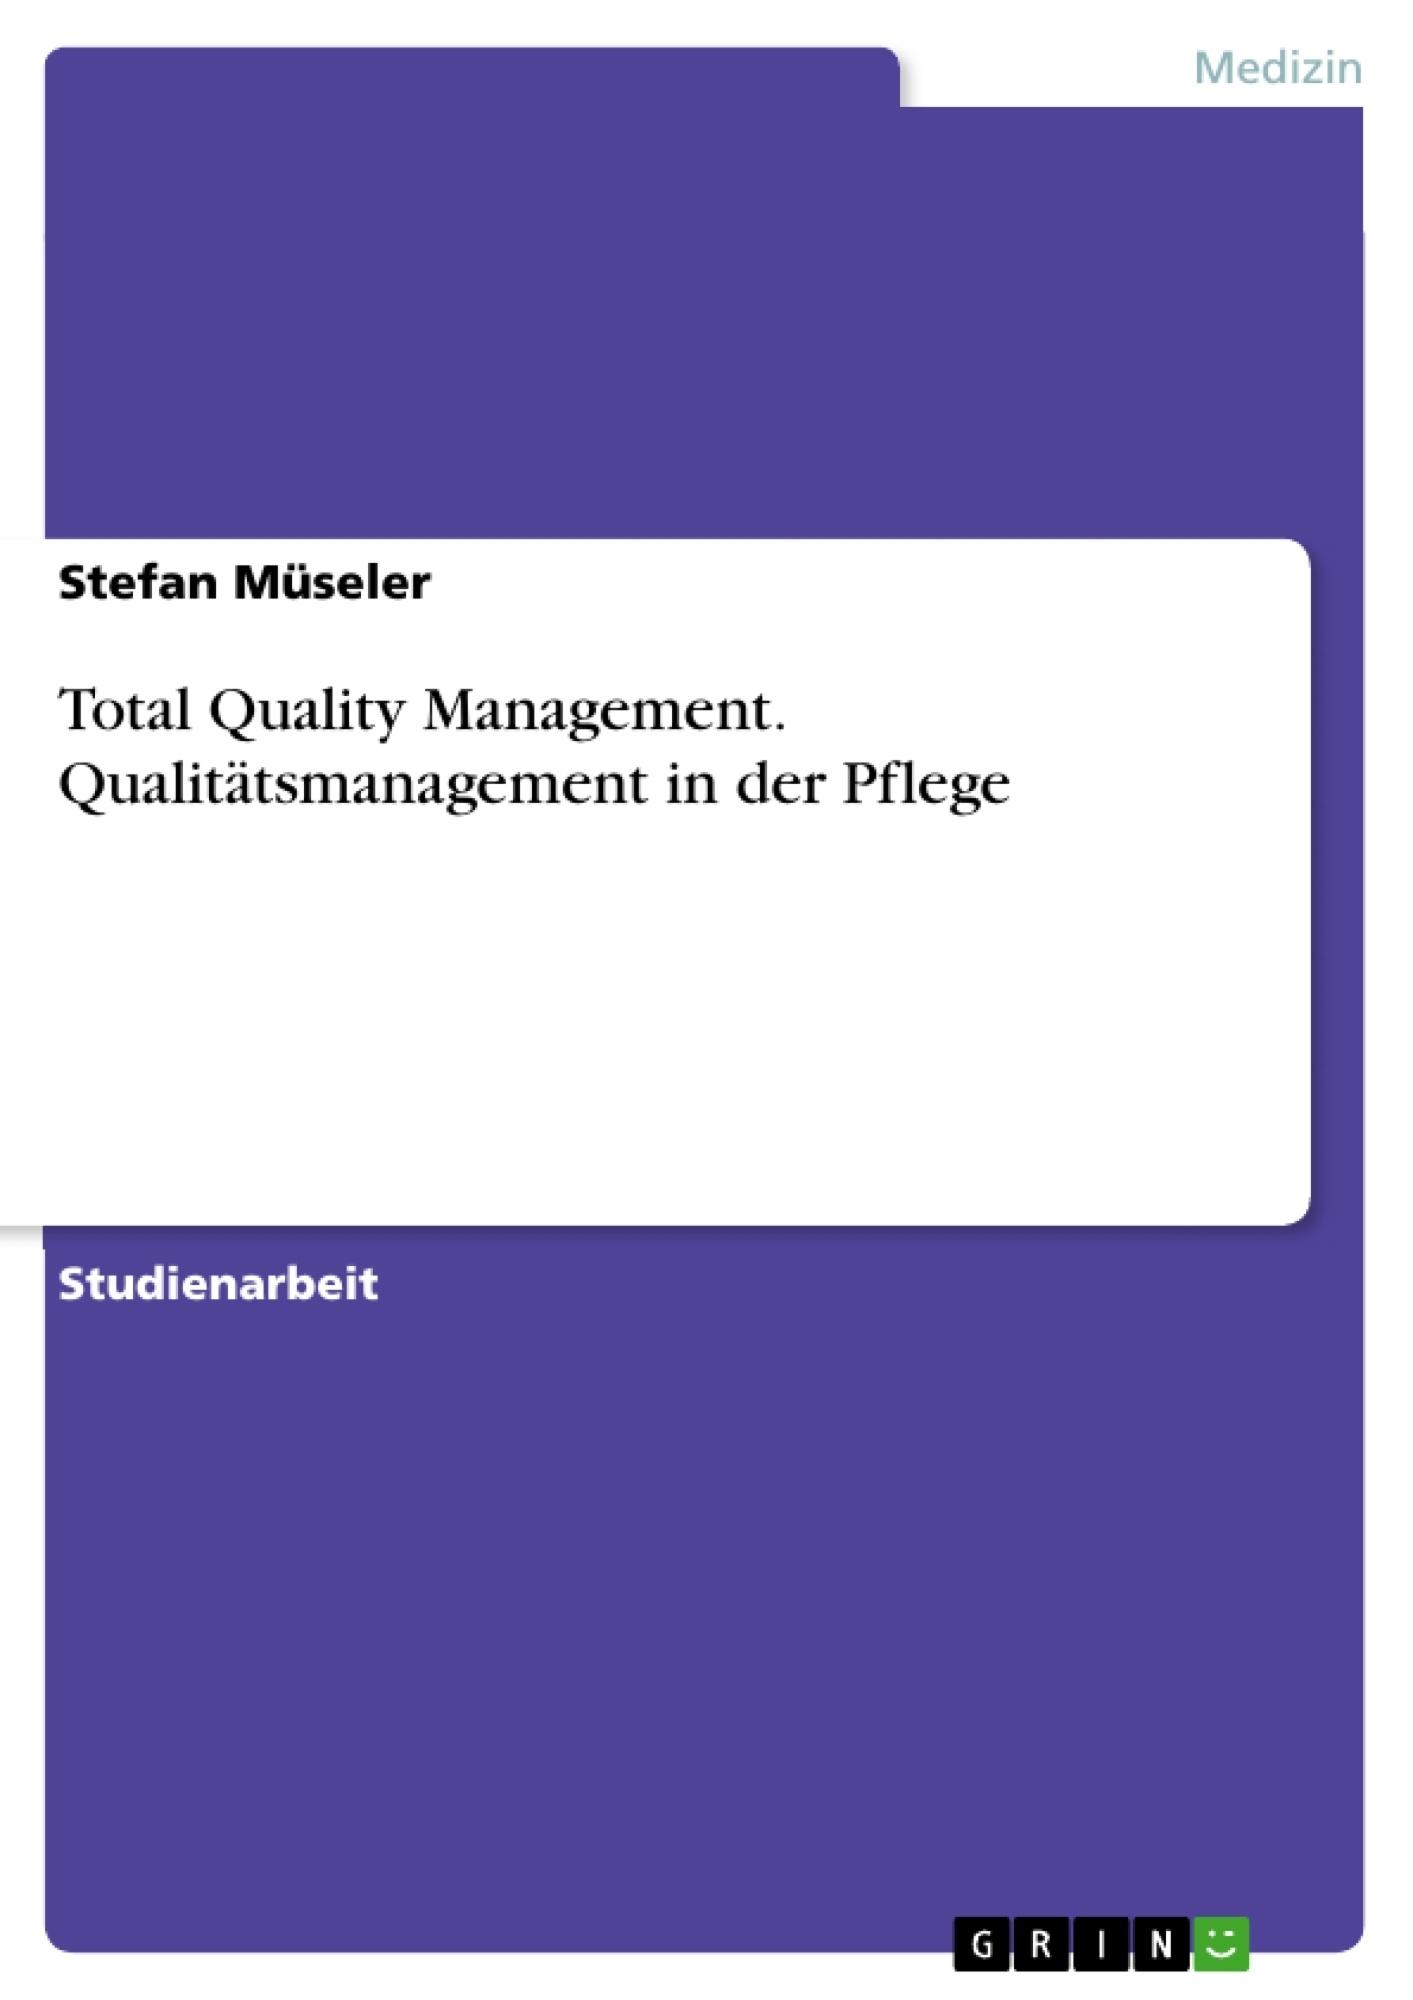 Titel: Total Quality Management. Qualitätsmanagement in der Pflege